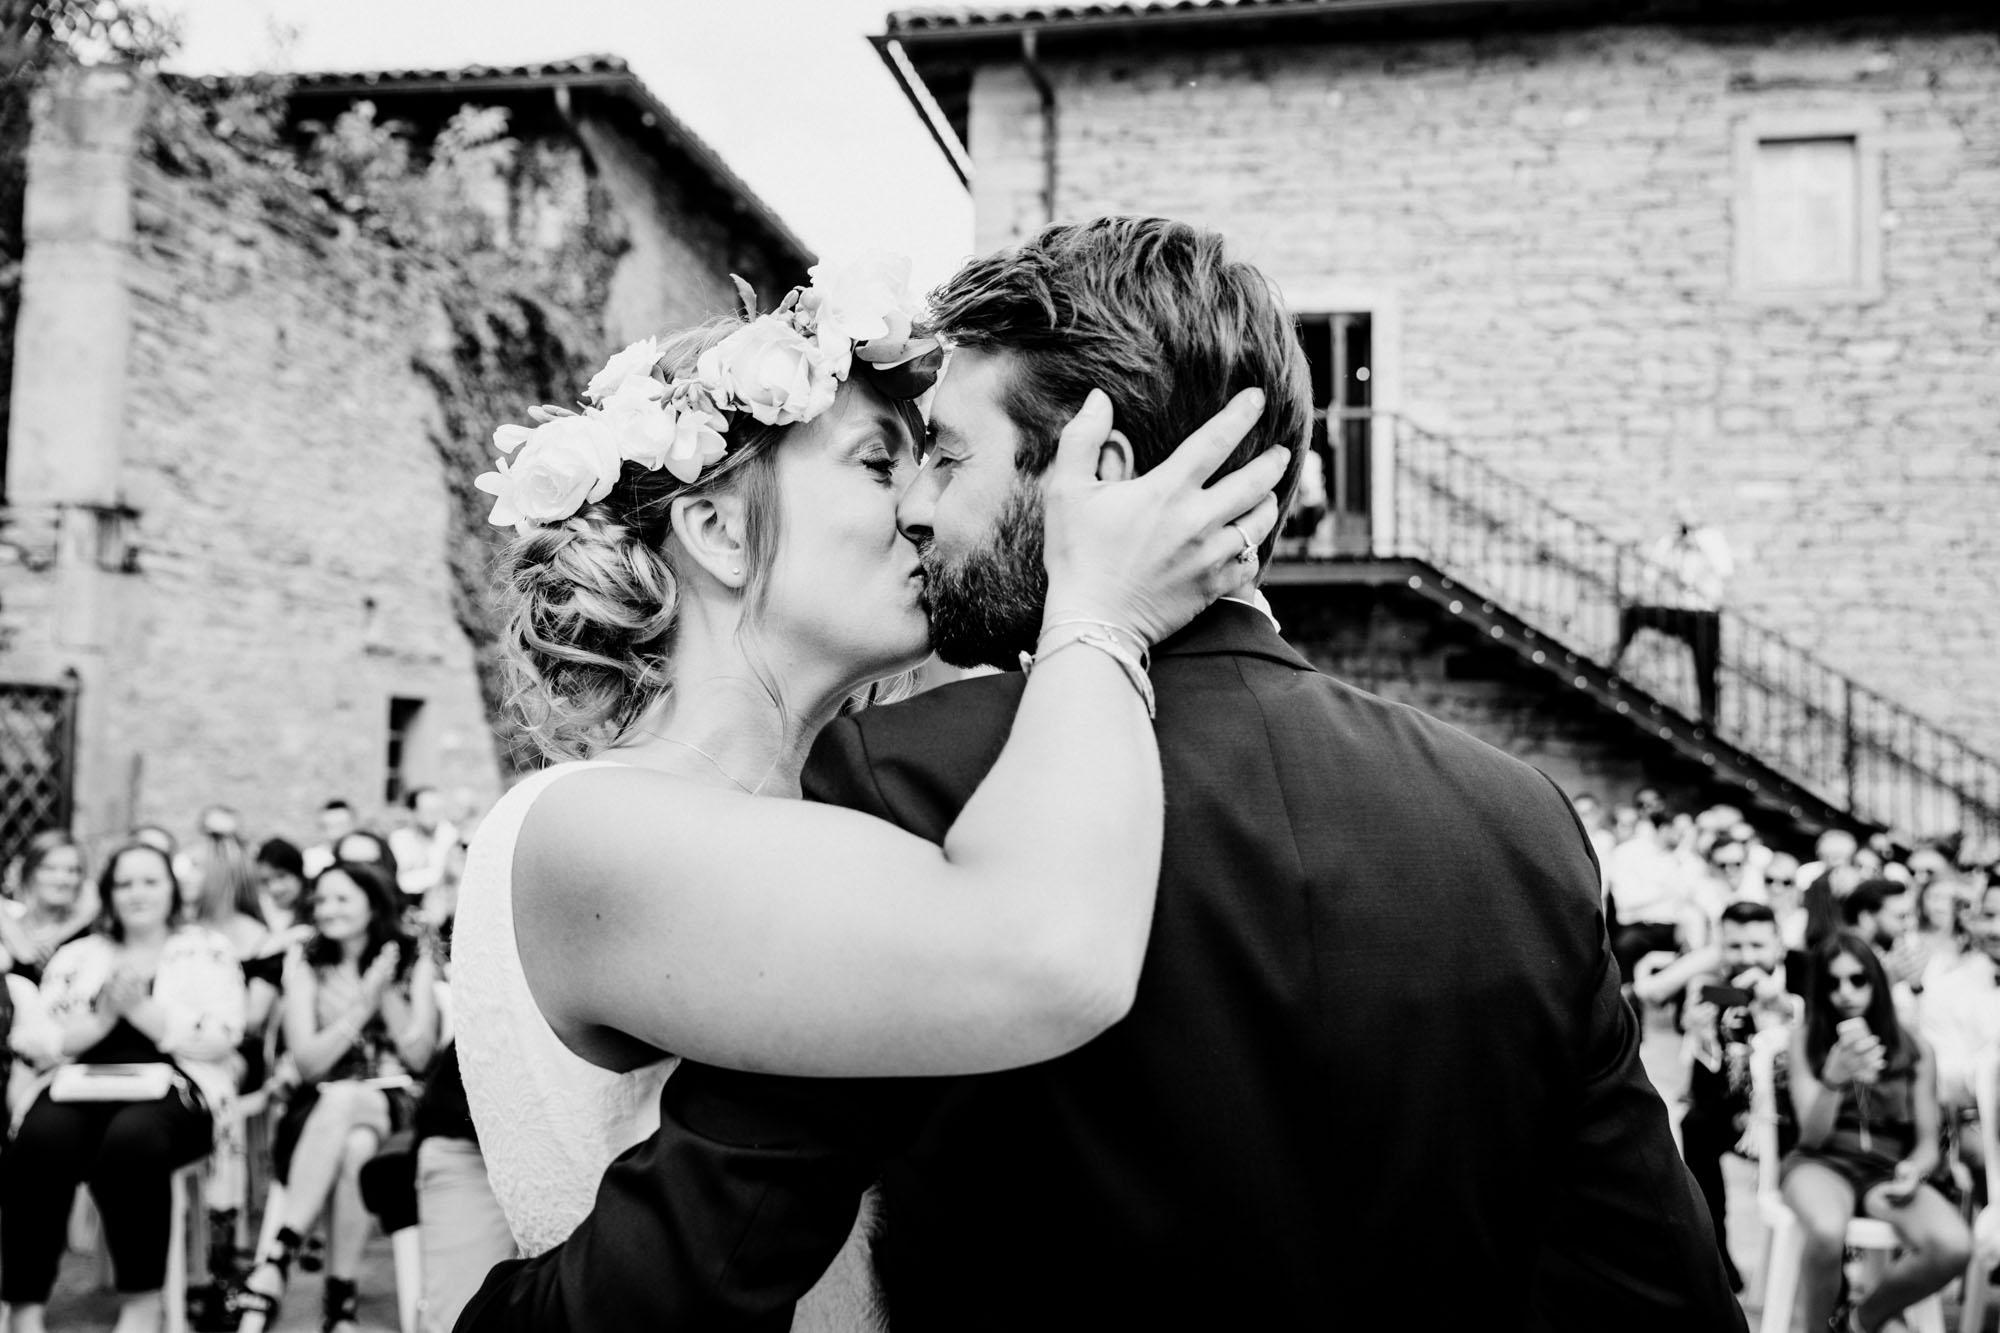 2018-07-21 - LD8_9975 - photographe mariage lyon - laurie diaz - www.lauriediazweeding.com.jpg